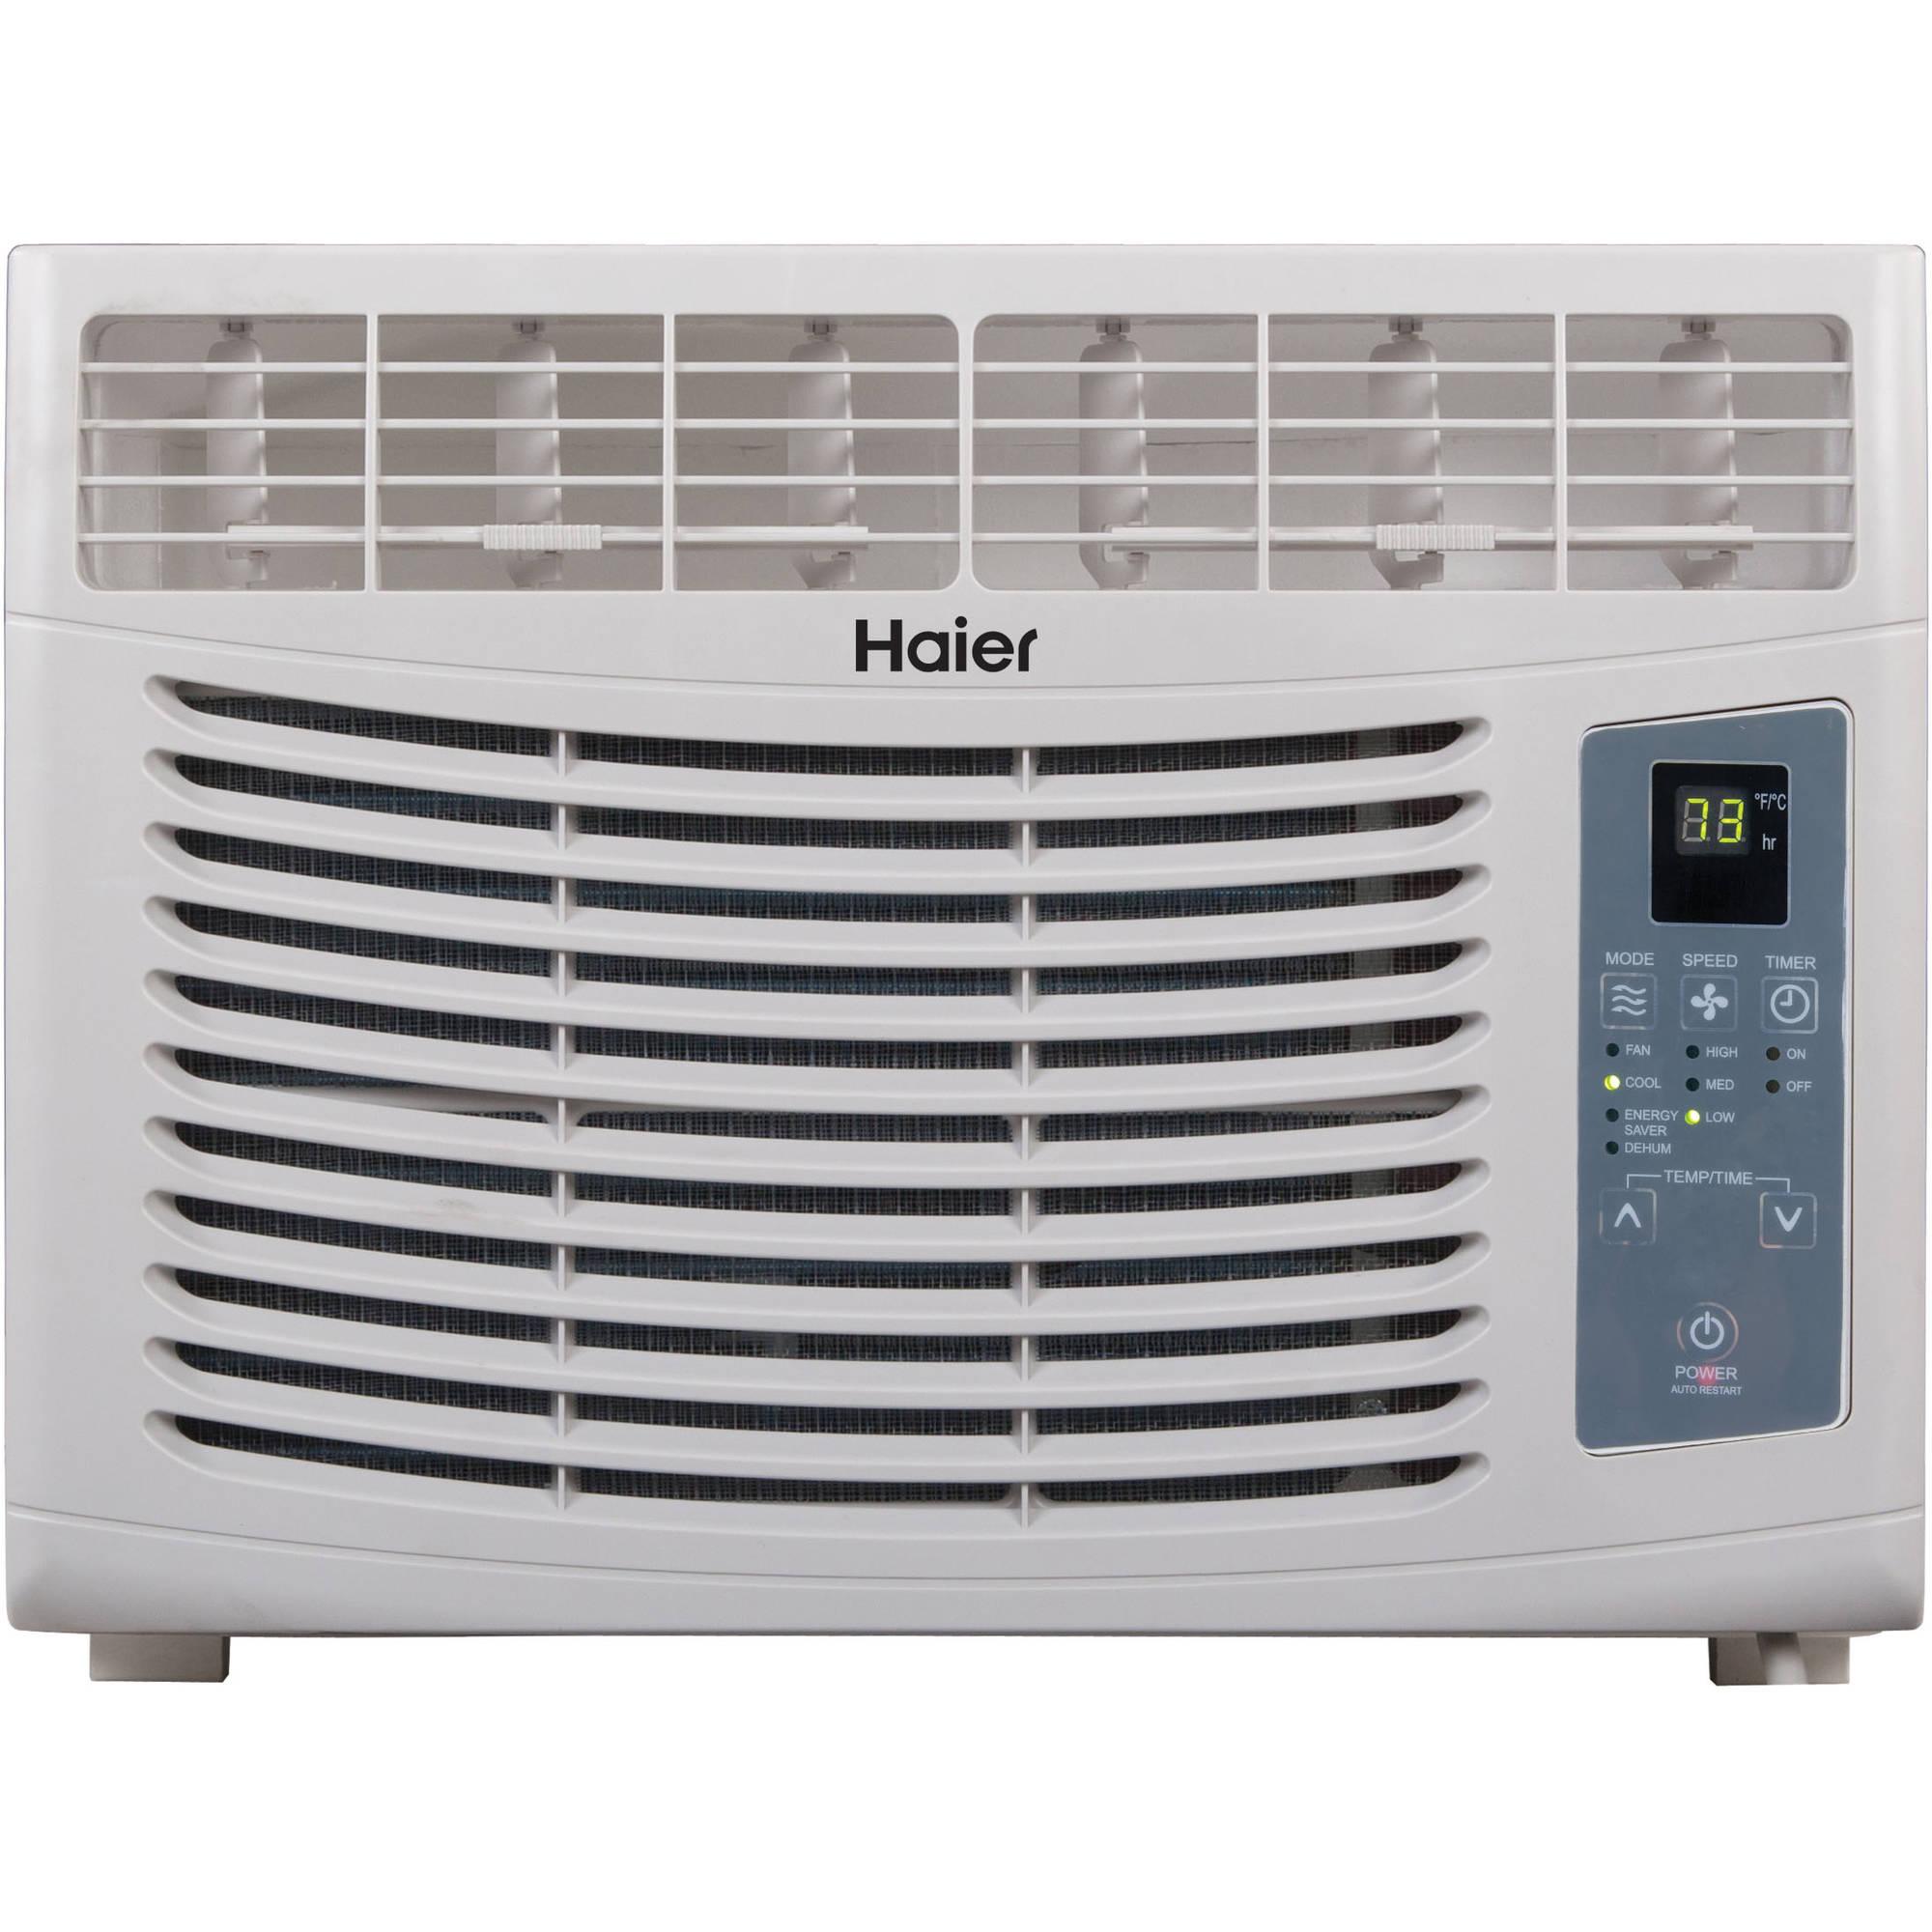 Haier 5,000 BTU Window Air Conditioner, 115V, HWR05XCR-LD